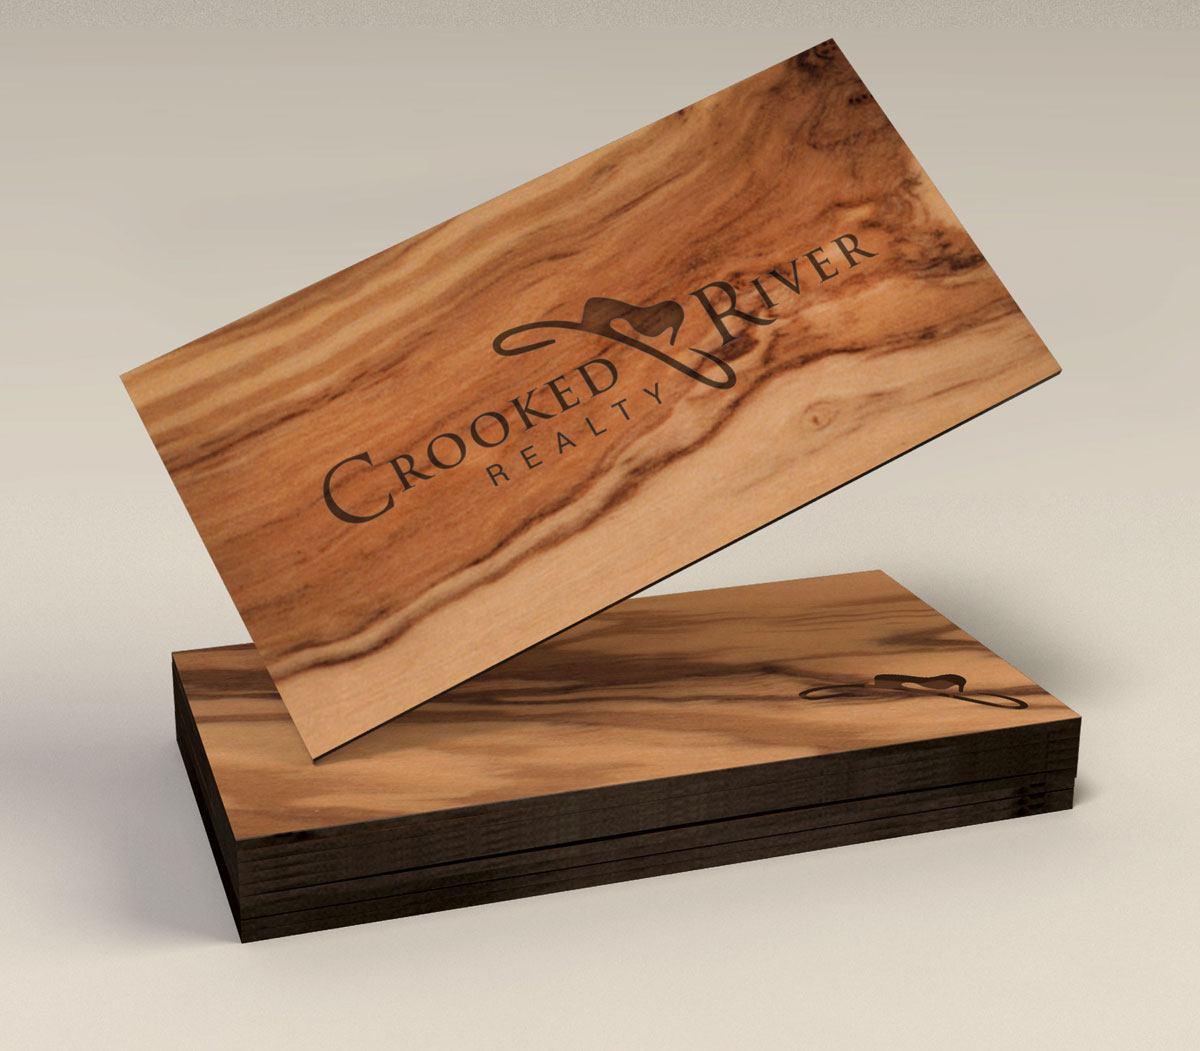 Wooden-Crooked-River_Logo-Design